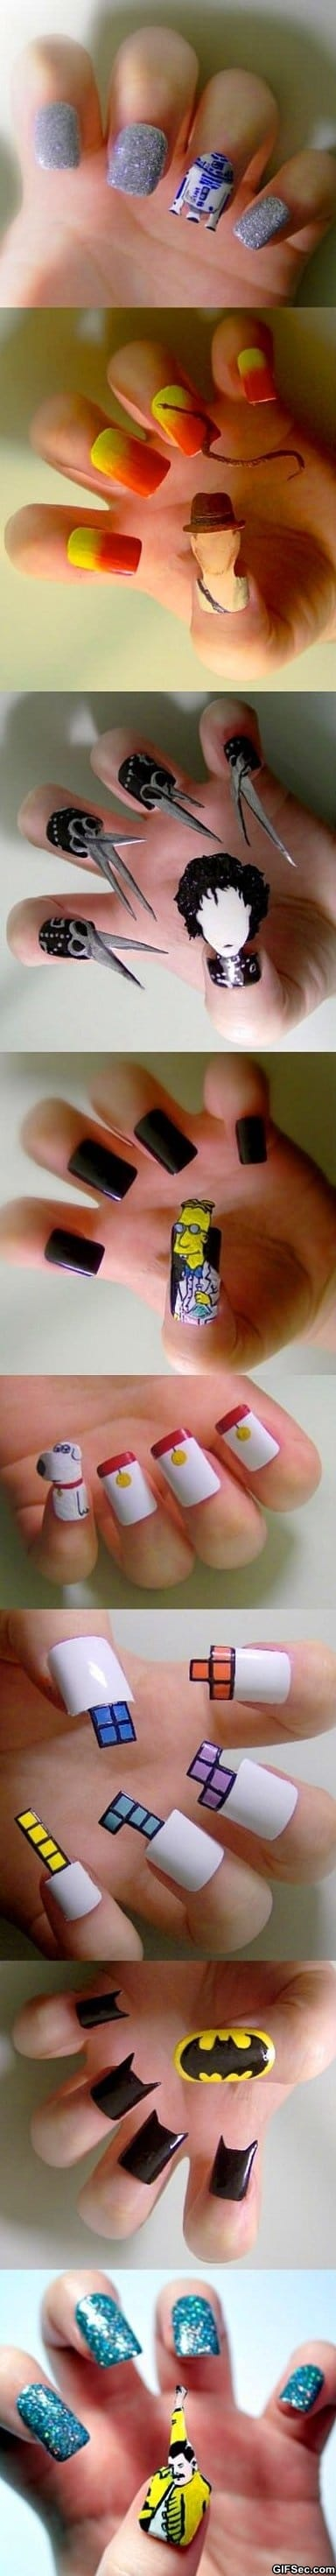 awesome-nail-art